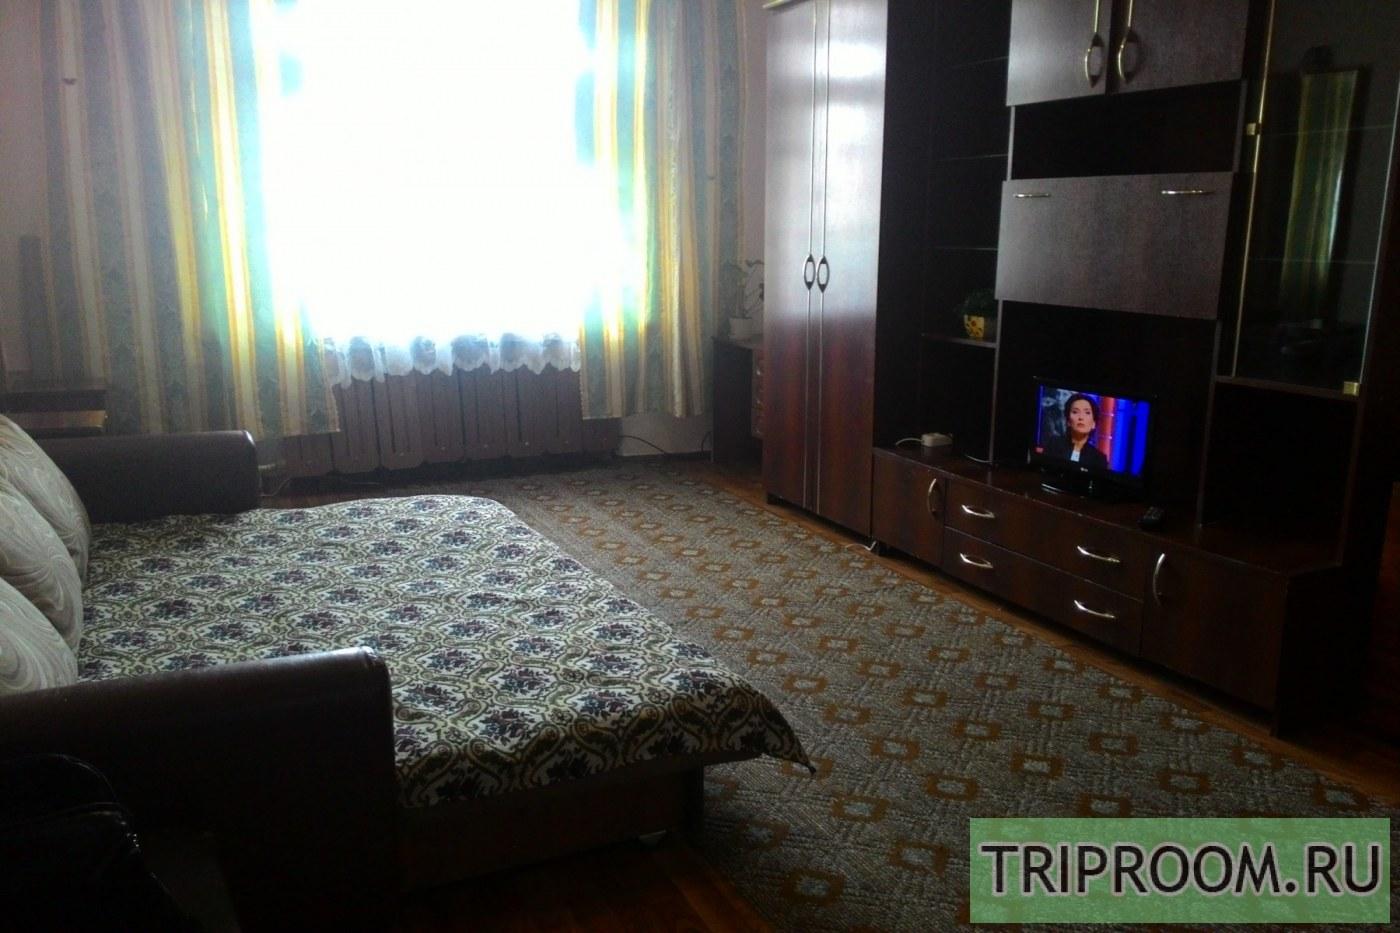 1-комнатная квартира посуточно (вариант № 37669), ул. Германа Титова улица, фото № 1